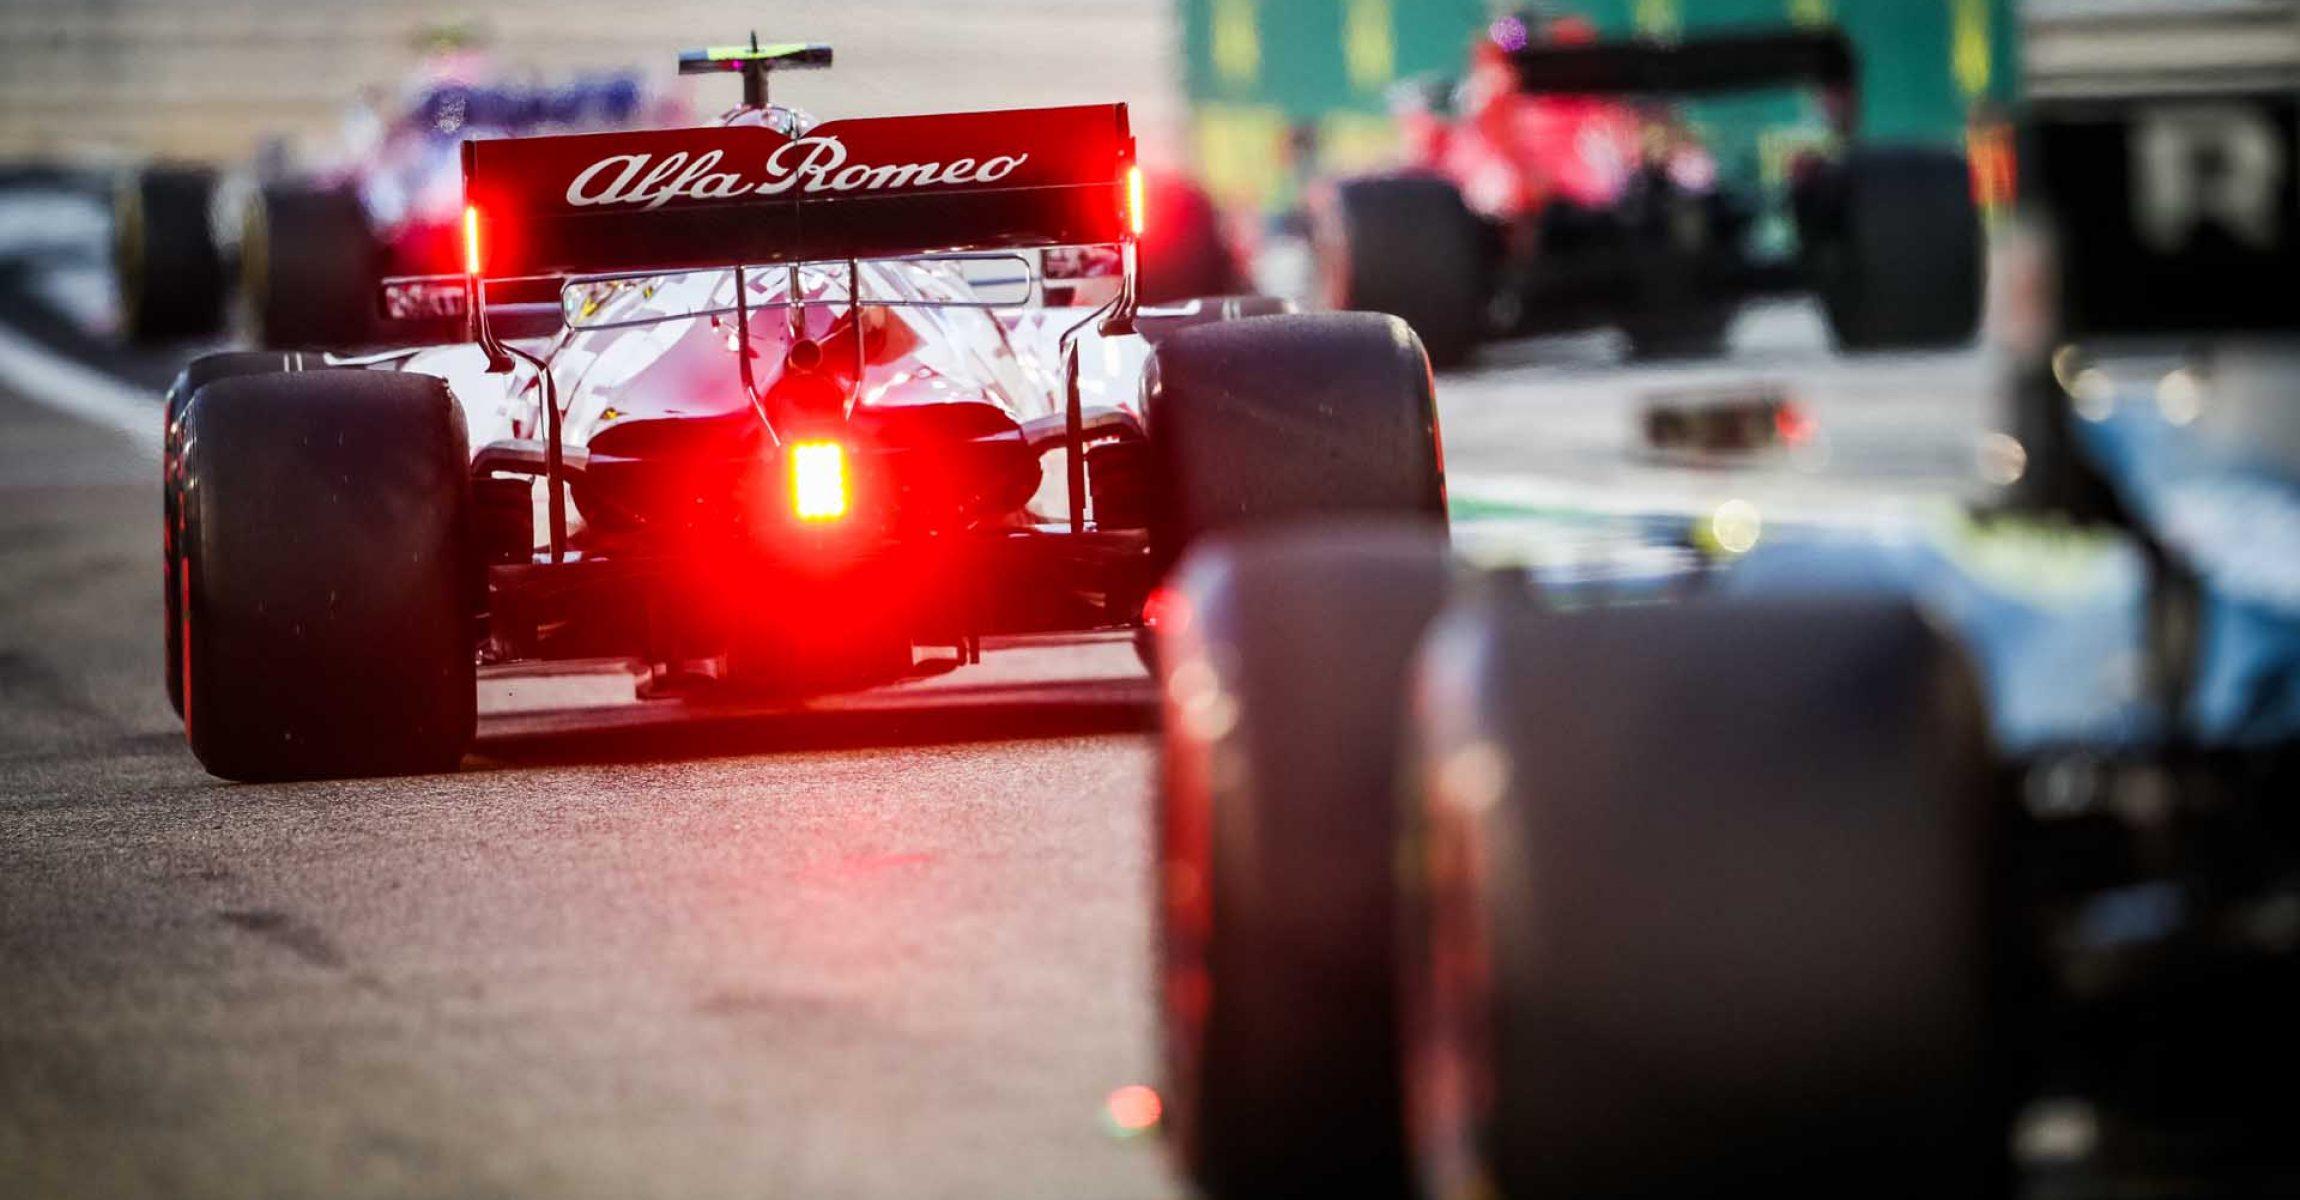 99 GIOVINAZZI Antonio (ita), Alfa Romeo Racing ORLEN C39, action during the Formula 1 Gulf Air Bahrain Grand Prix 2020, from November 27 to 29, 2020 on the Bahrain International Circuit, in Sakhir, Bahrain - Photo Antonin Vincent / DPPI